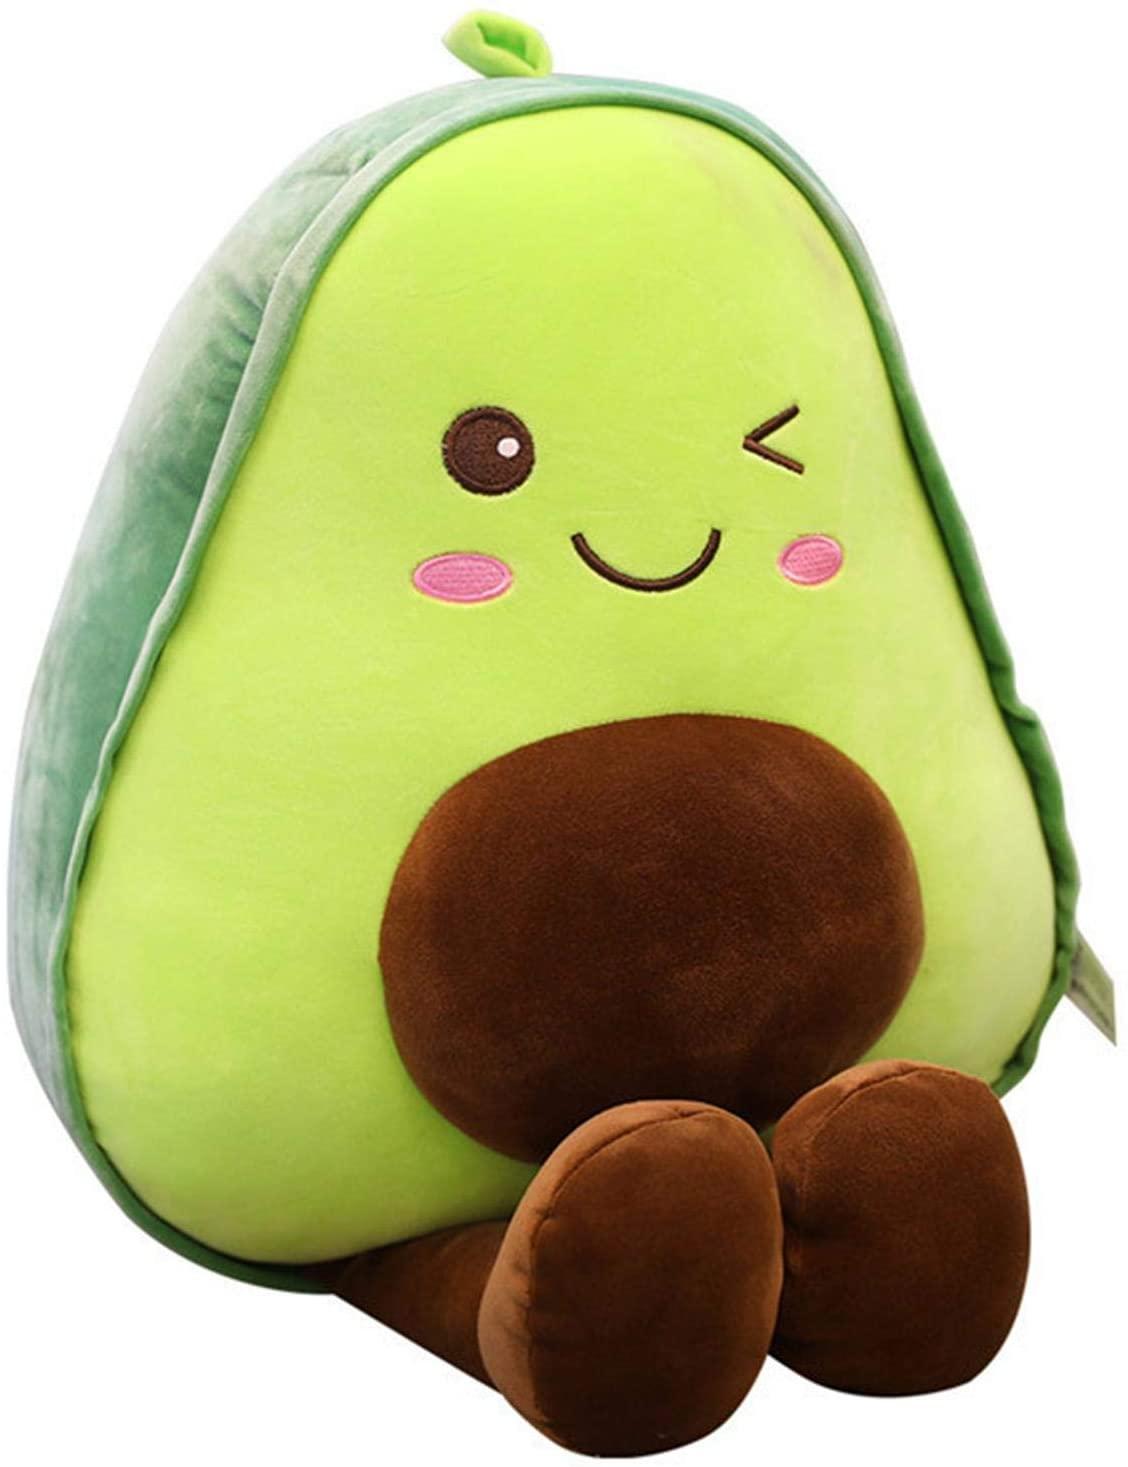 TOPATY Cute Avocado Plush Toy,Avocado Stuffed Pillow Gift for Girls Boys Friends